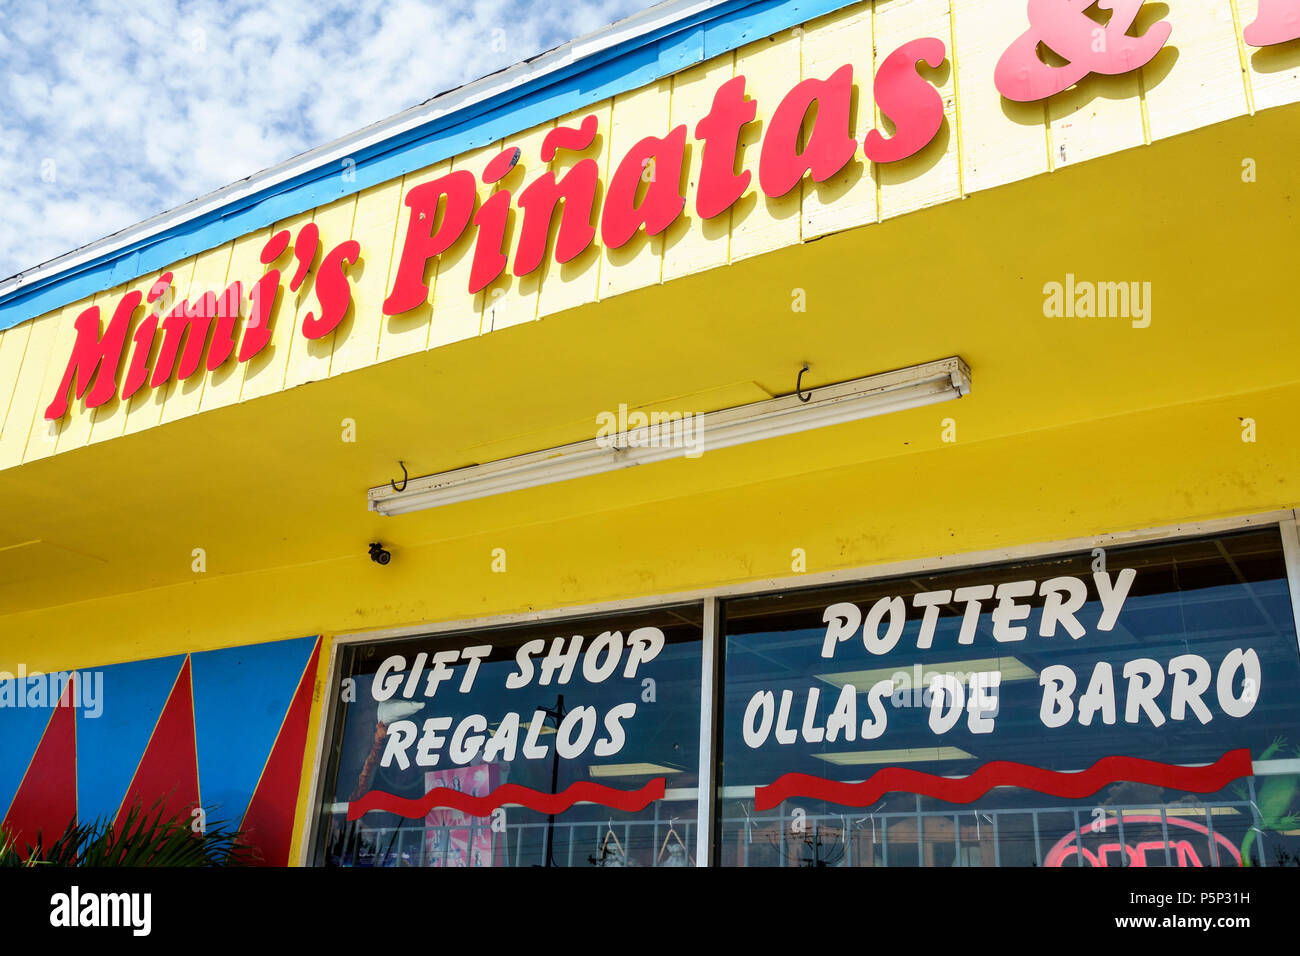 Pinatas Stock Photos & Pinatas Stock Images - Alamy